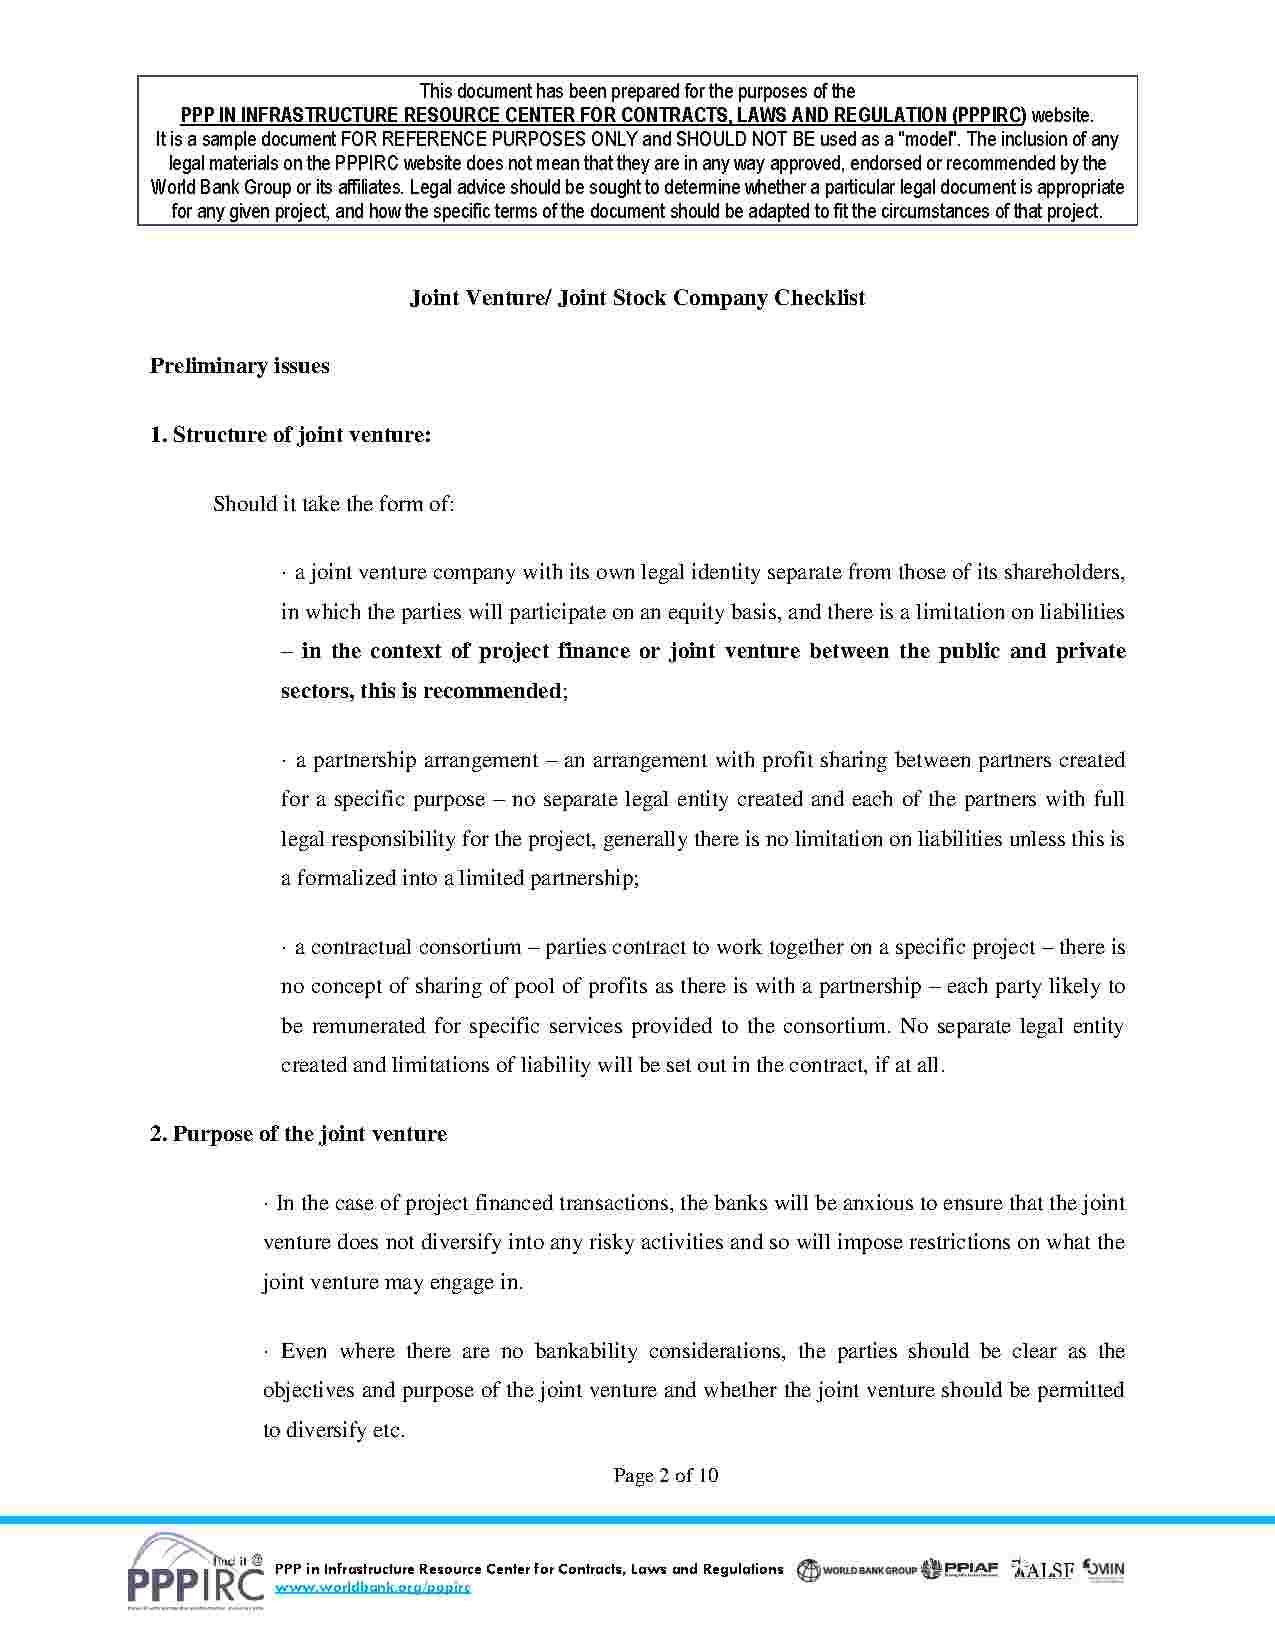 Joint Venture Agreement Joint venture, Agreement, Templates